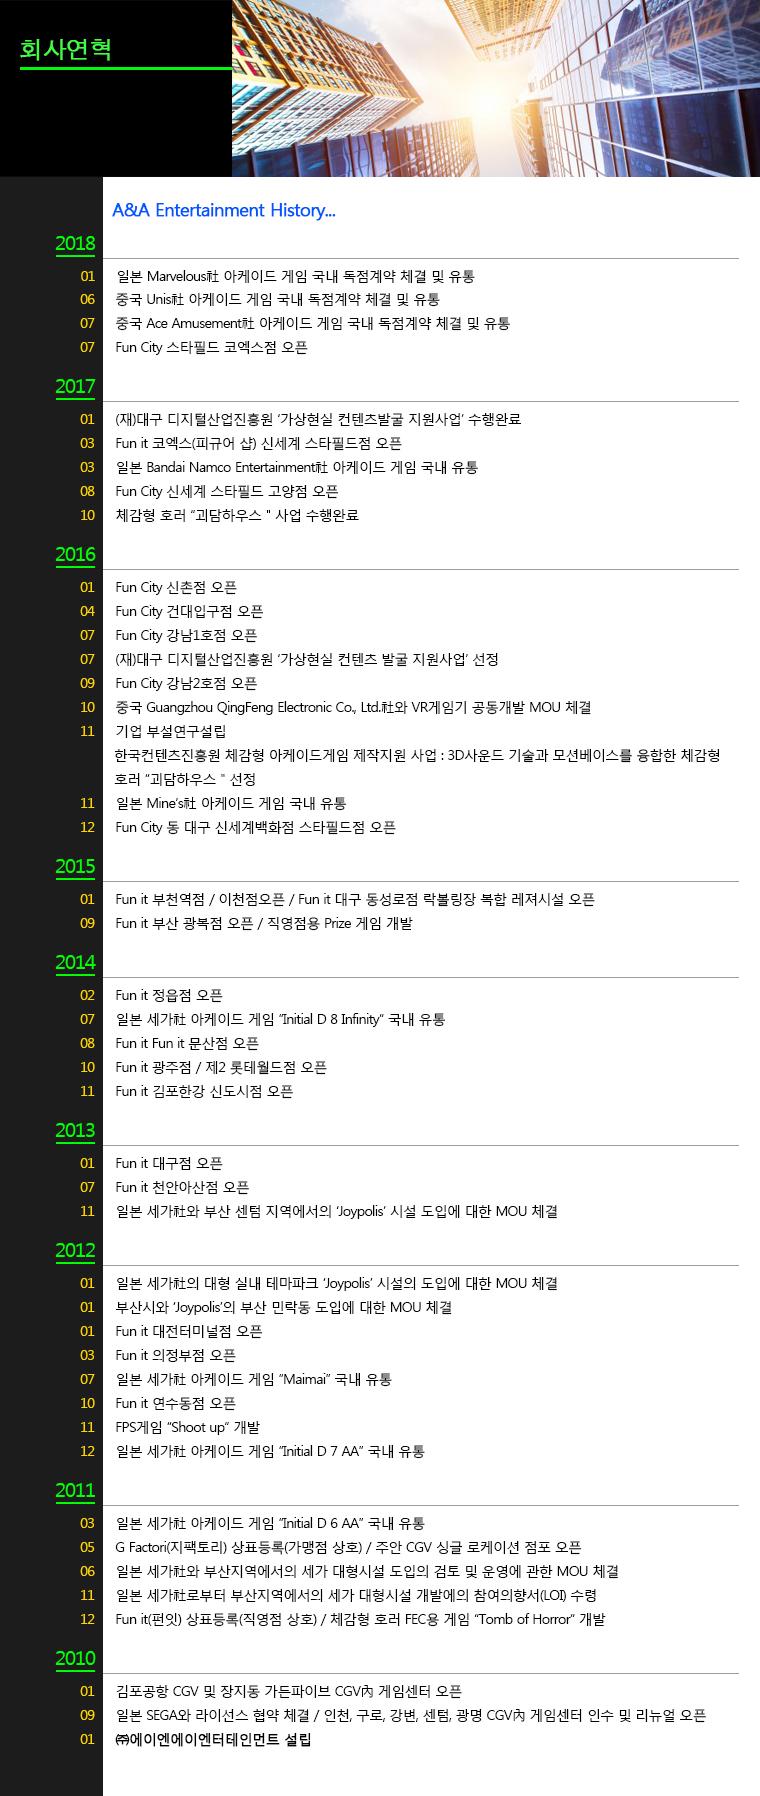 A&A 엔터테인먼트-회사연혁-001.jpg